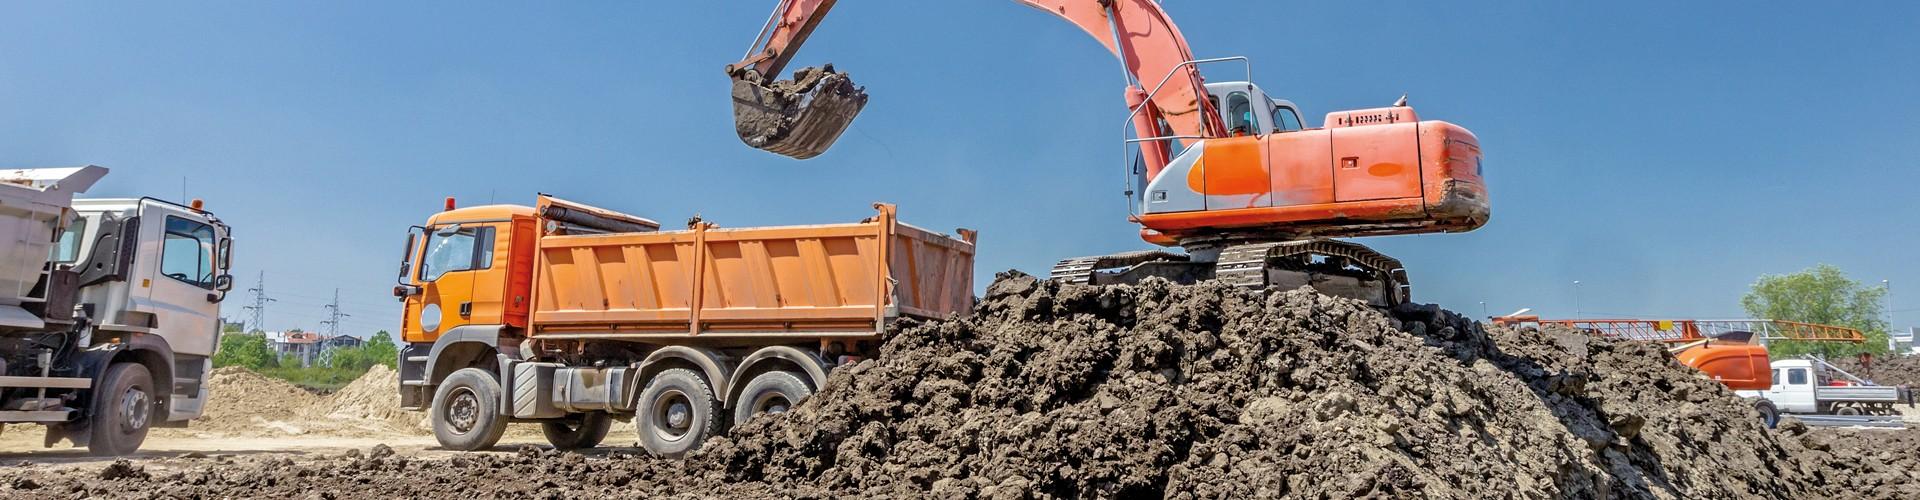 Reprise de terres de chantiers